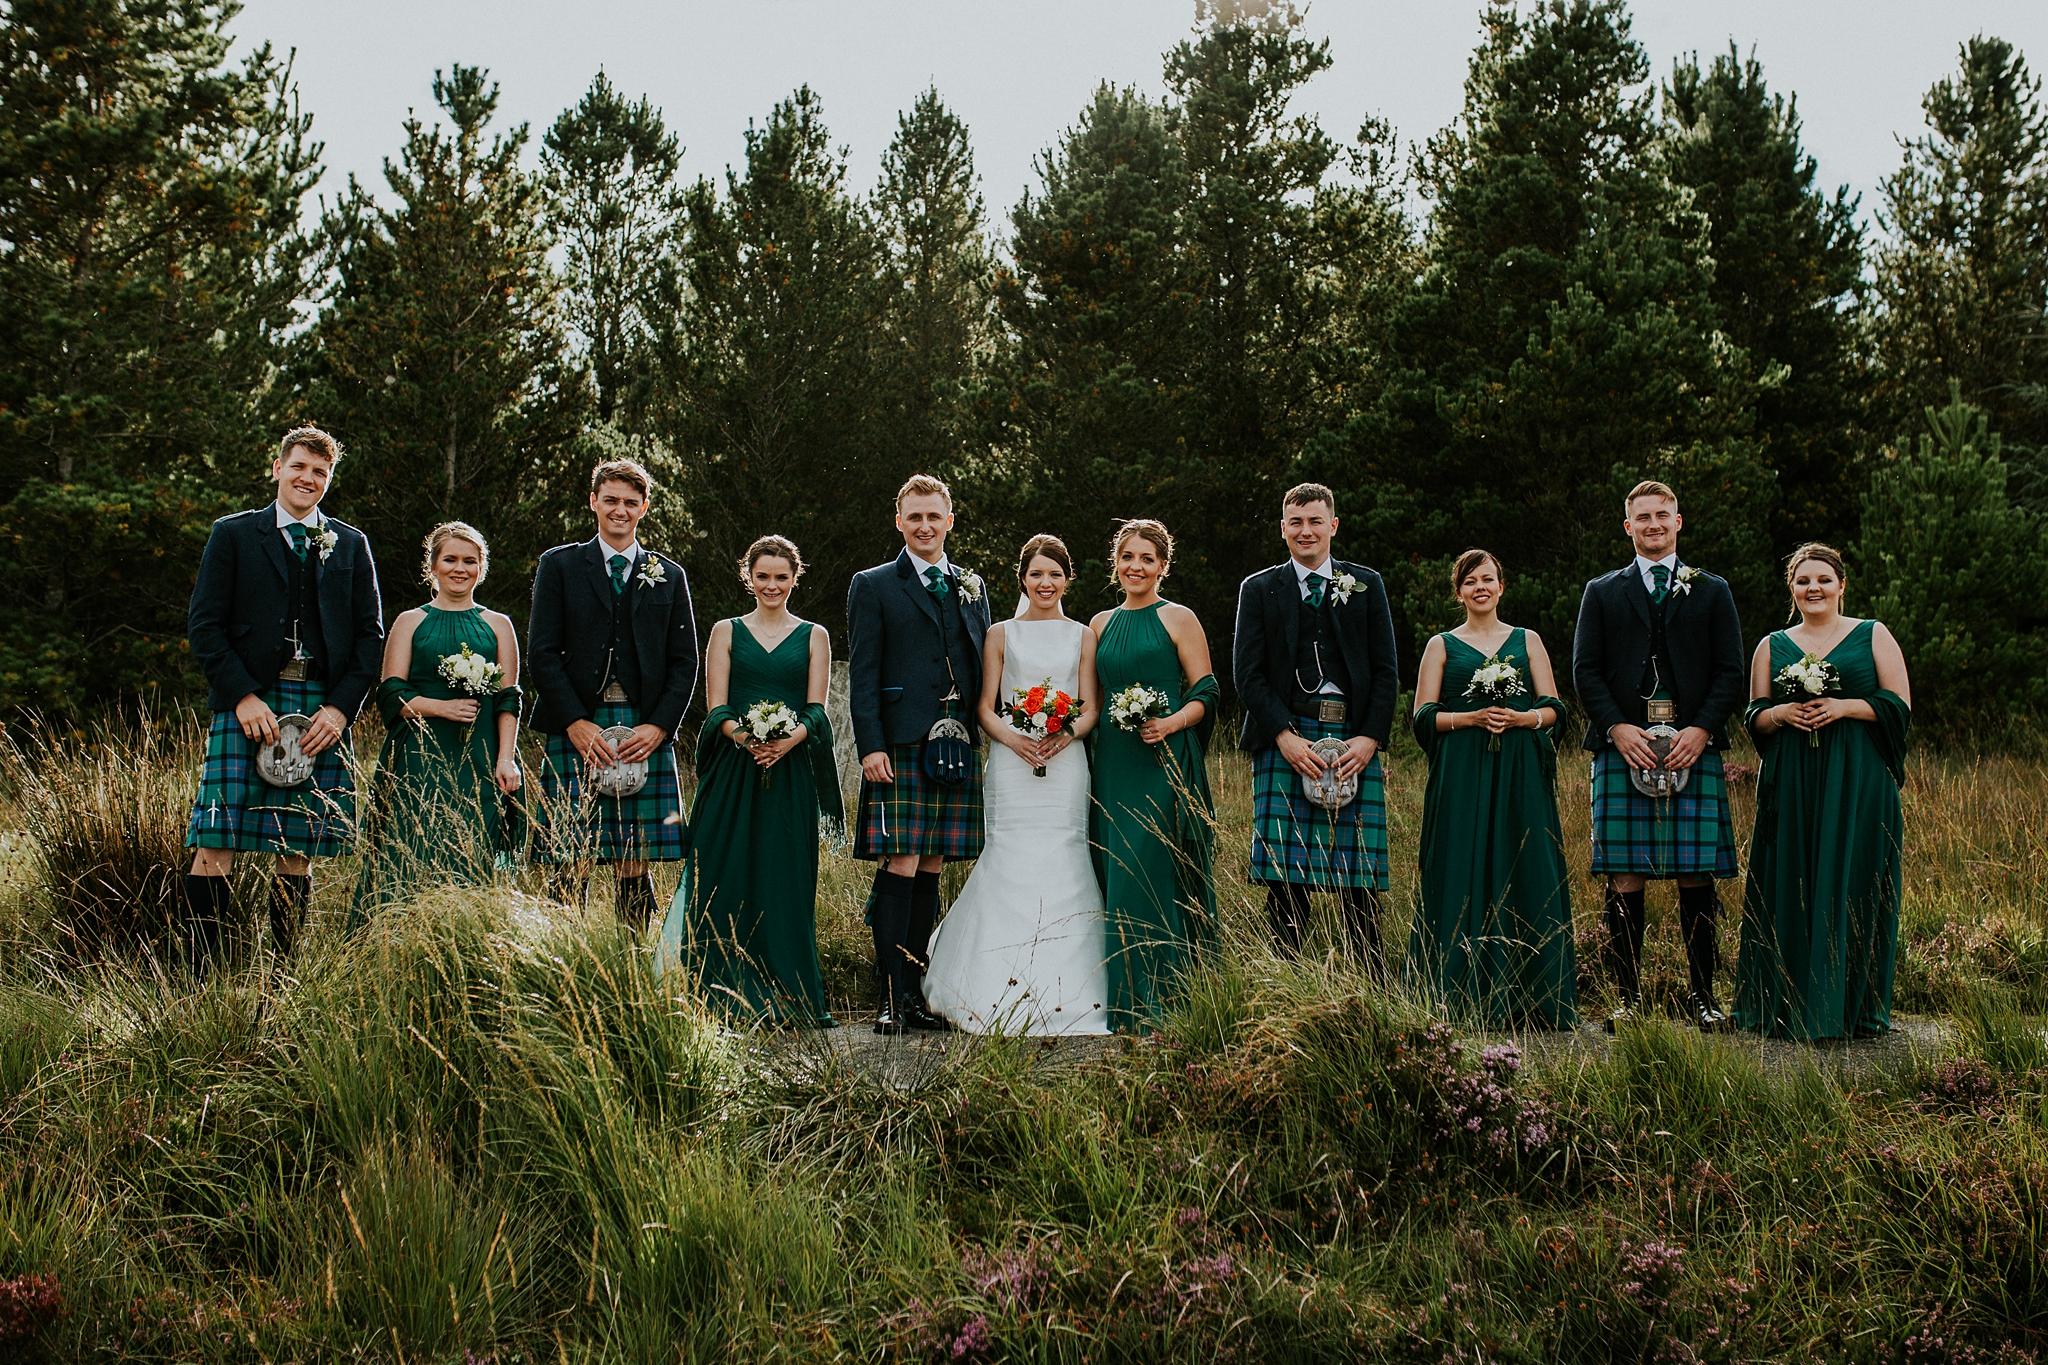 Linda&Shockie_northuist_wedding_photographer-35.JPG